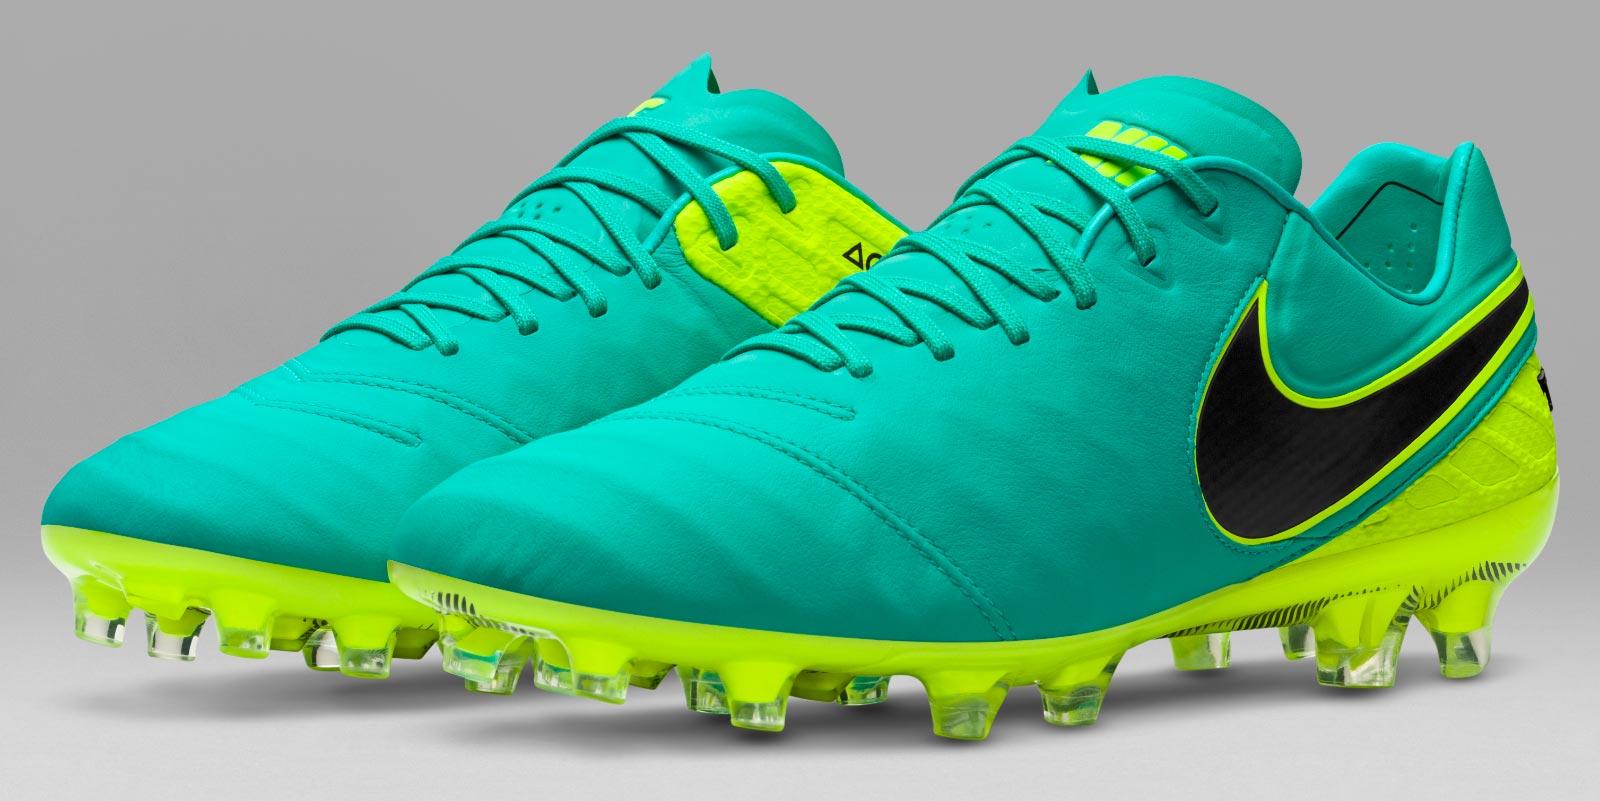 All Nike Football Shoes